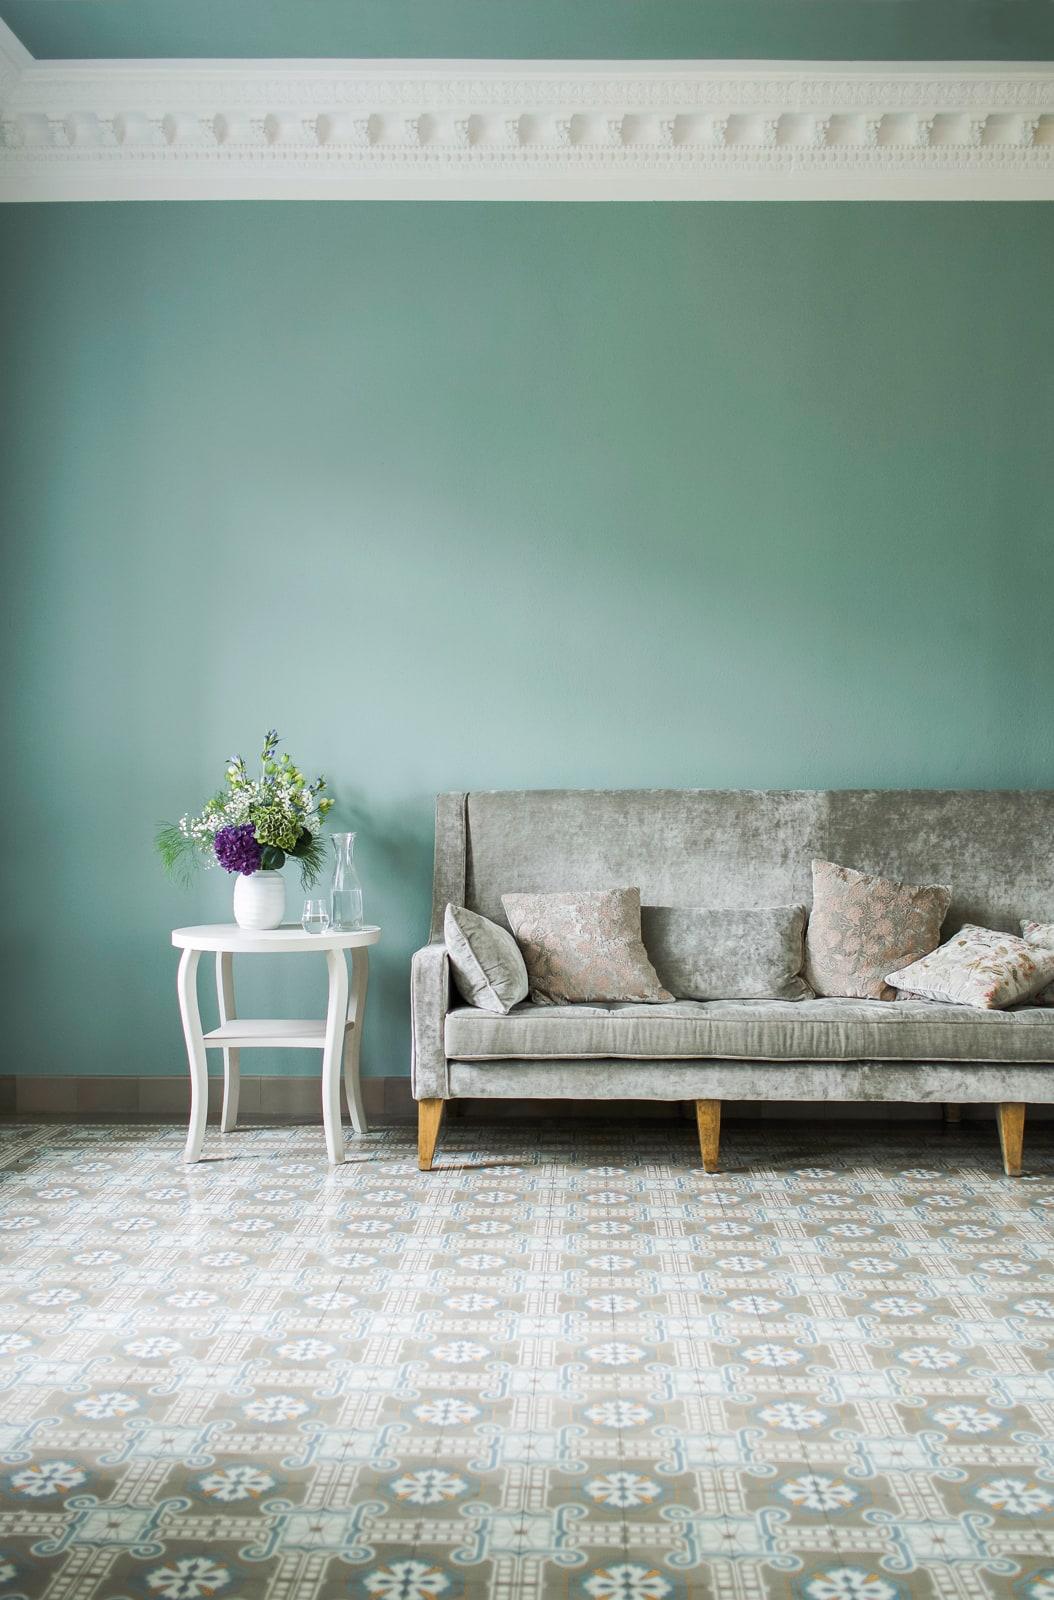 zementfliesen-terrazzofliesen-kreidefarbe-blauer-salon-terrazzo-fugenlos-viaplatten | Kreidefarbe Blauer Salon 2500 ml